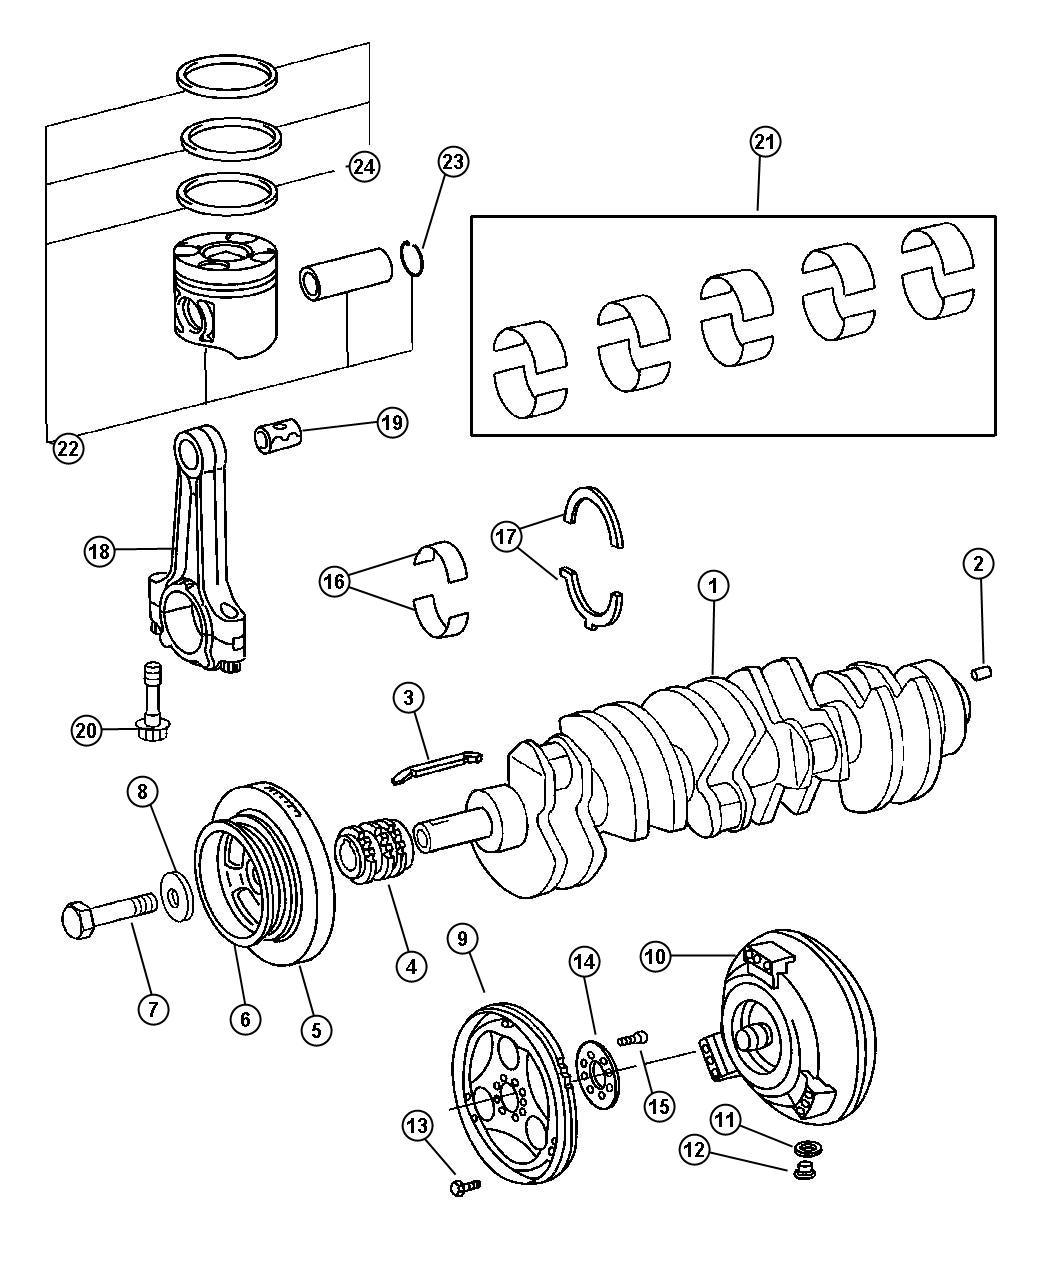 Dodge Sprinter Crankshaft And Pistons